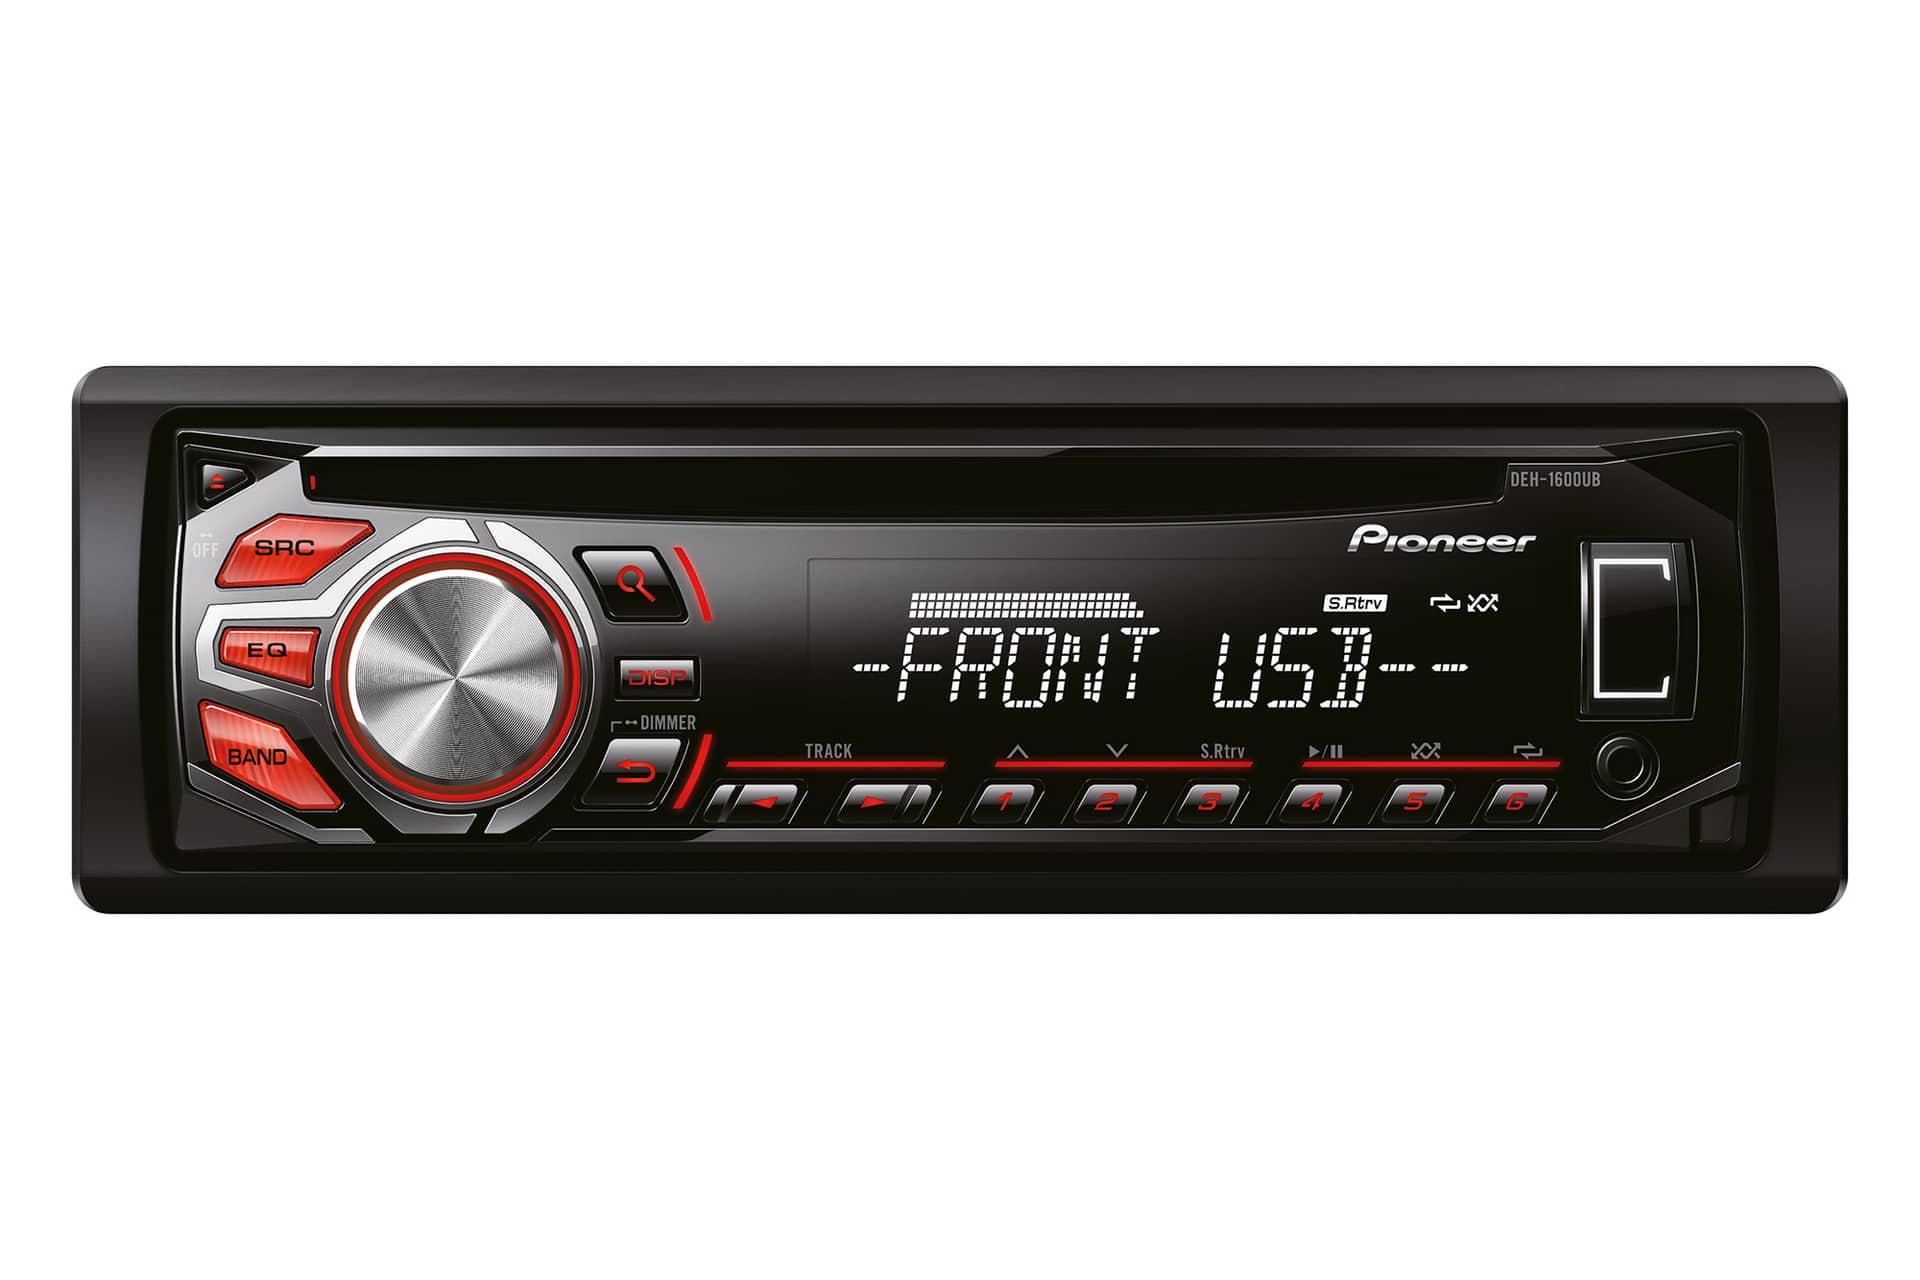 Pioneer DEH-1600UB inkl. 8GB USB-Stick für 54,99 Euro